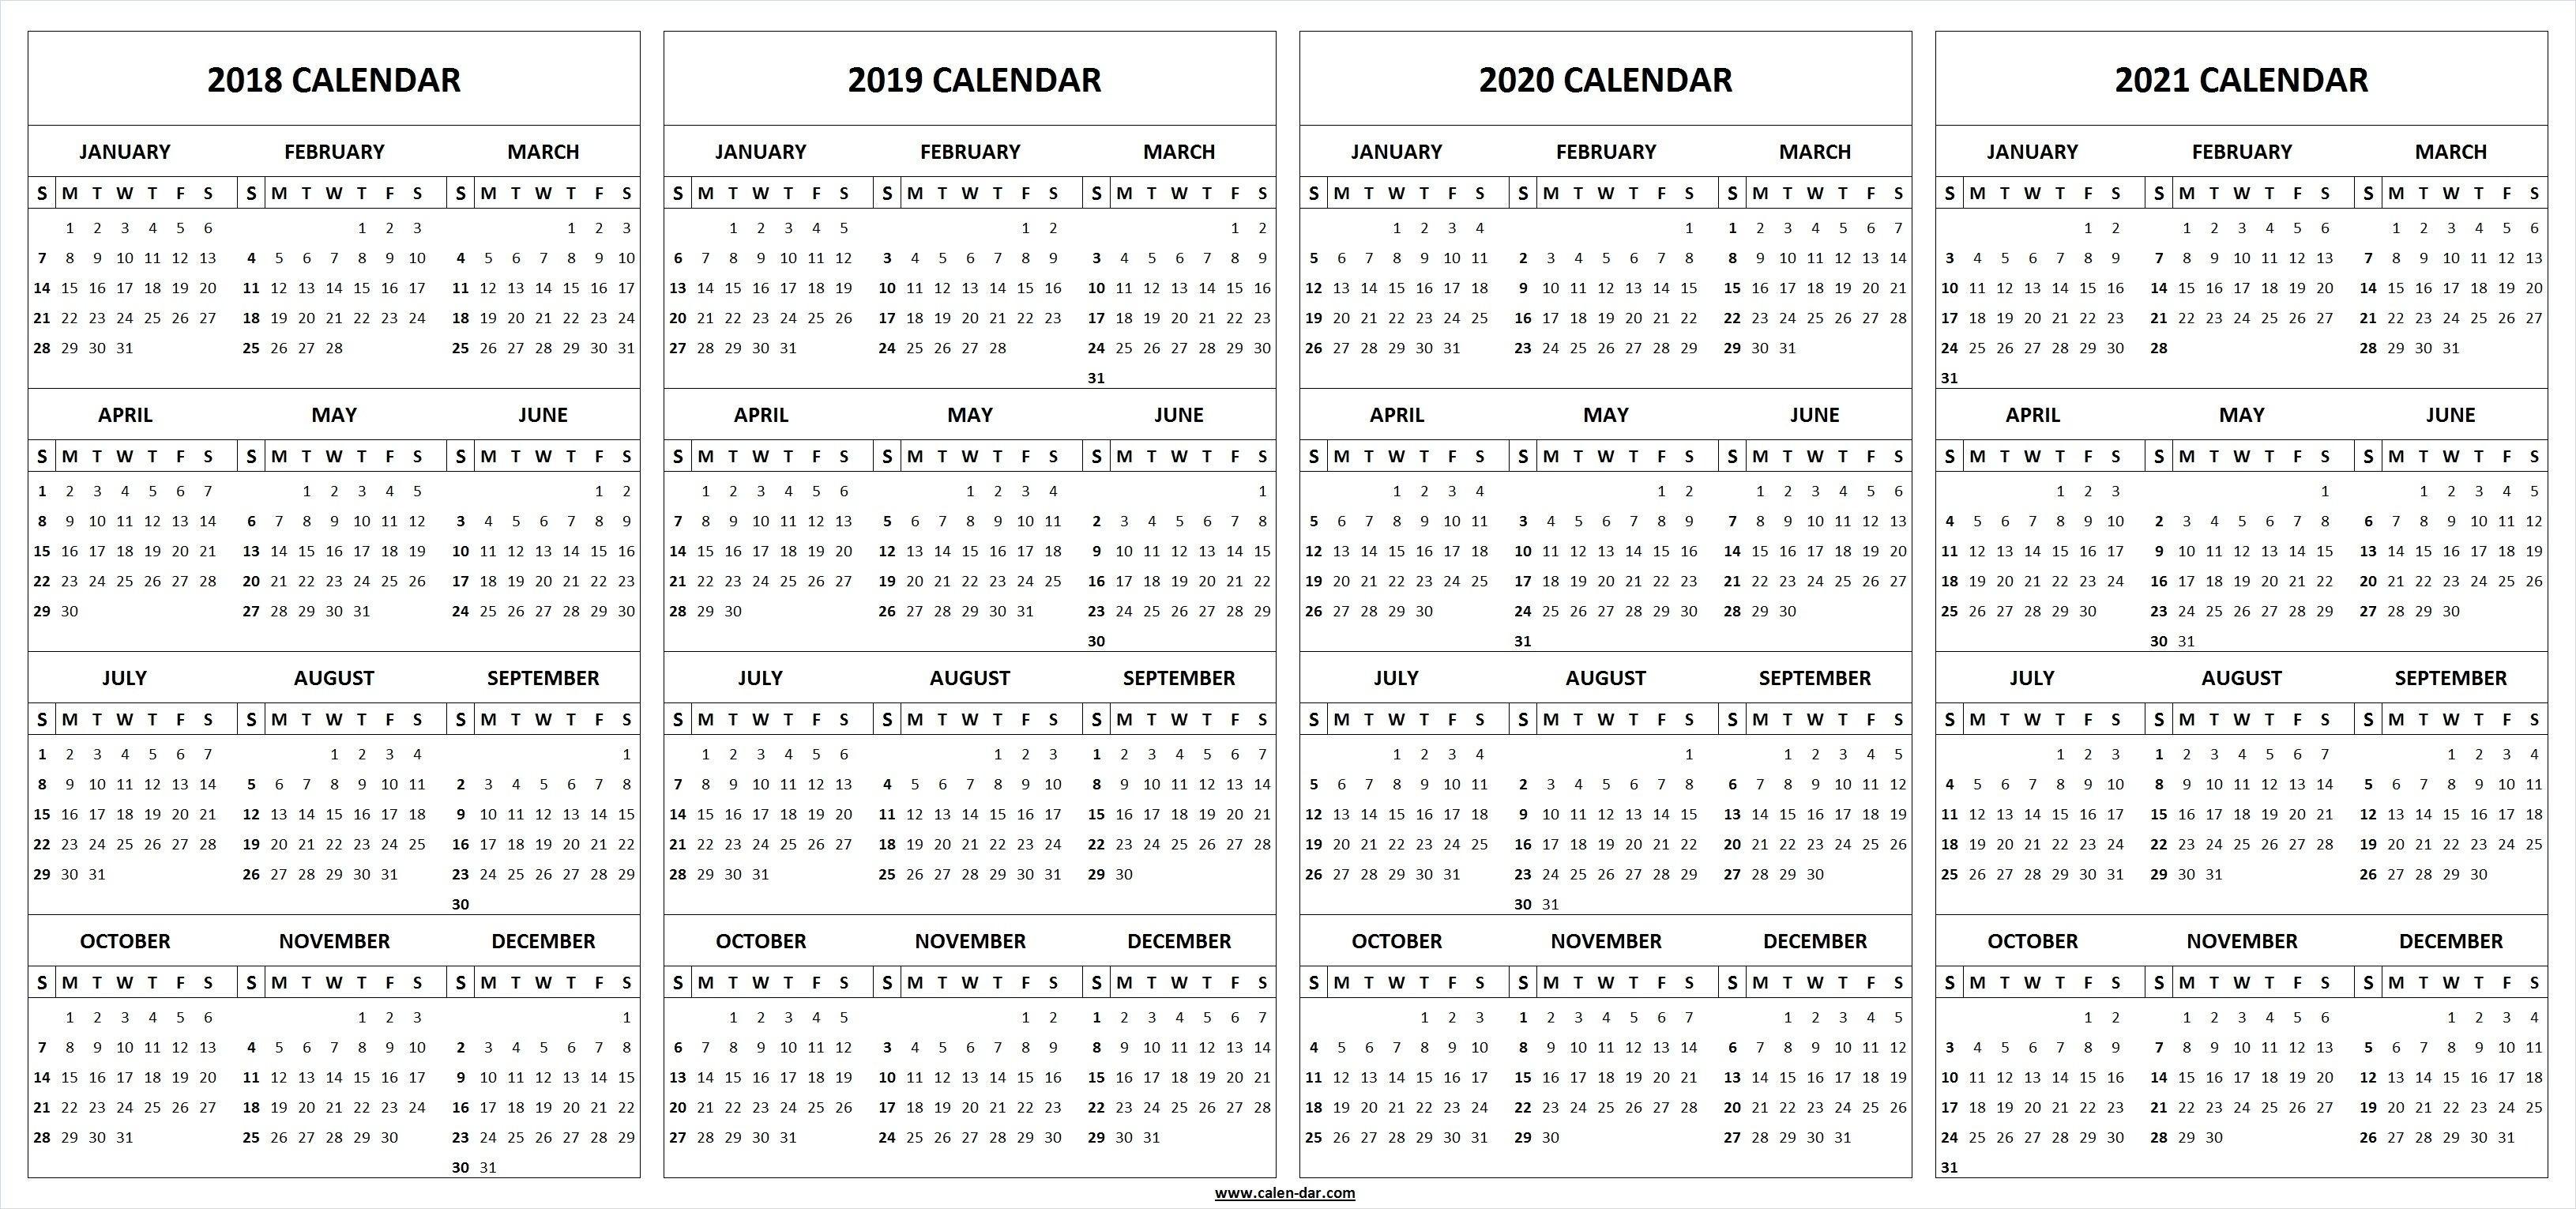 Adobe indesign calendar template 2020